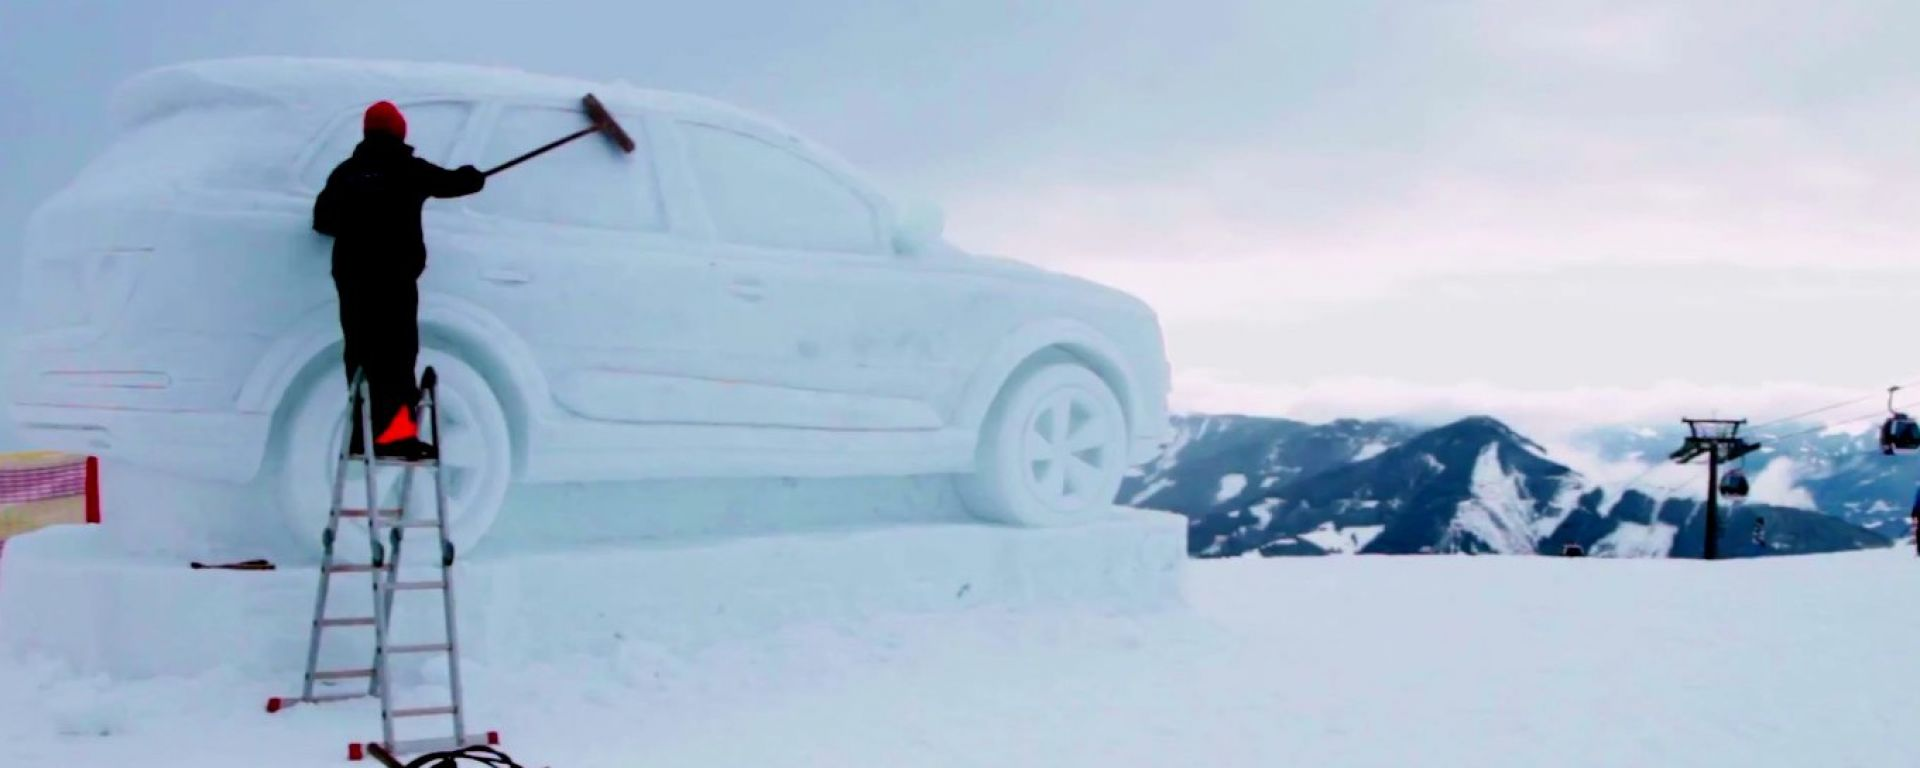 Audi: la Q7 diventa un pupazzo di neve